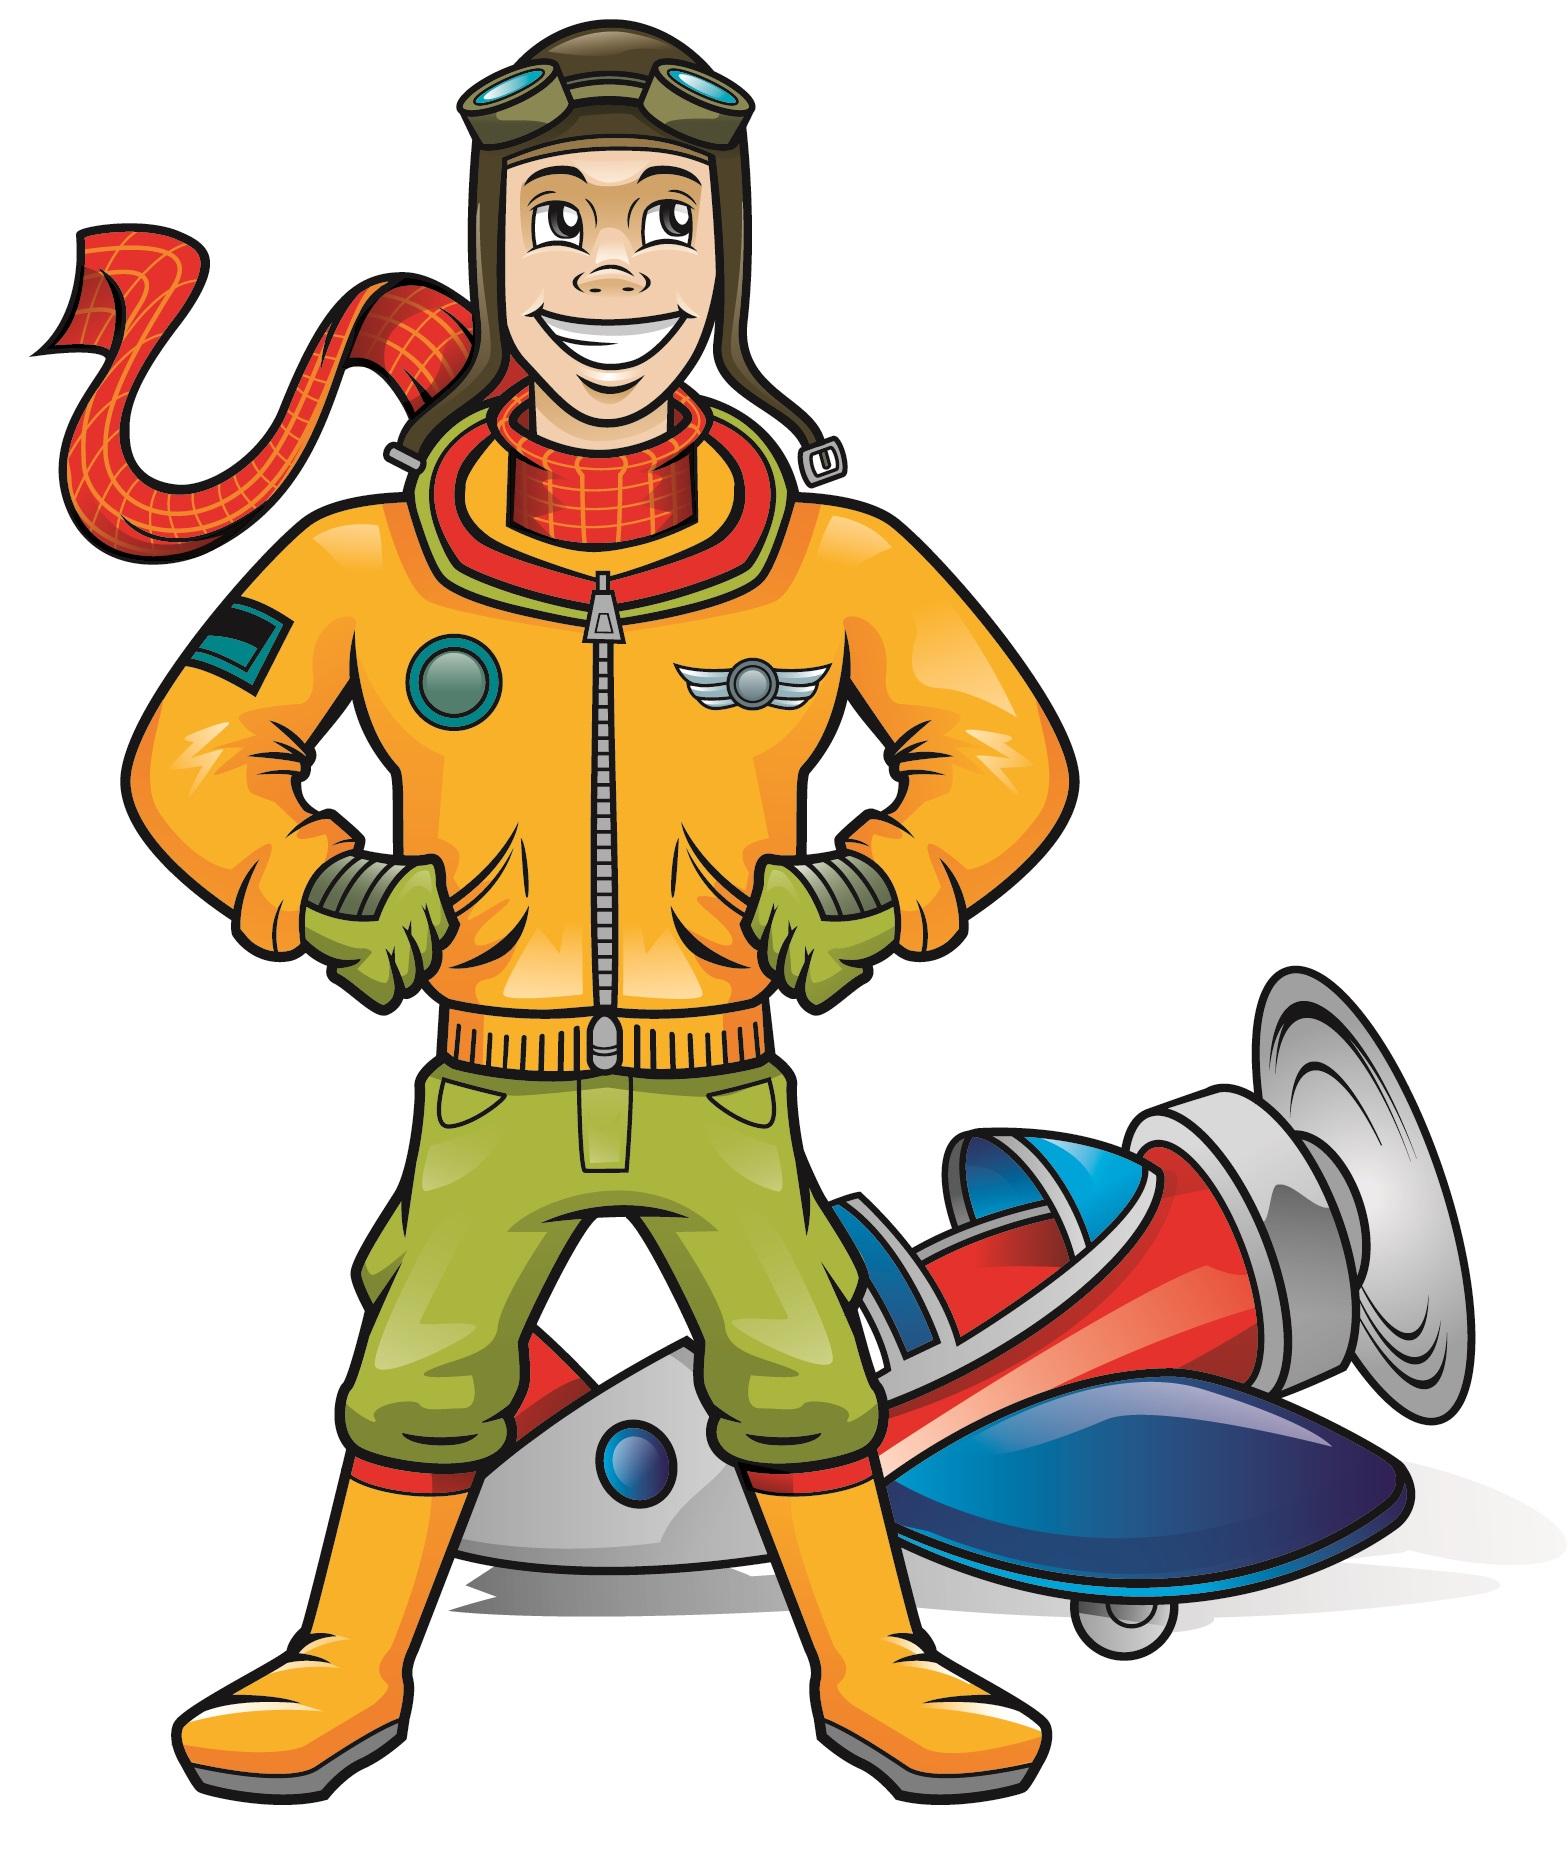 Pilot Mascot